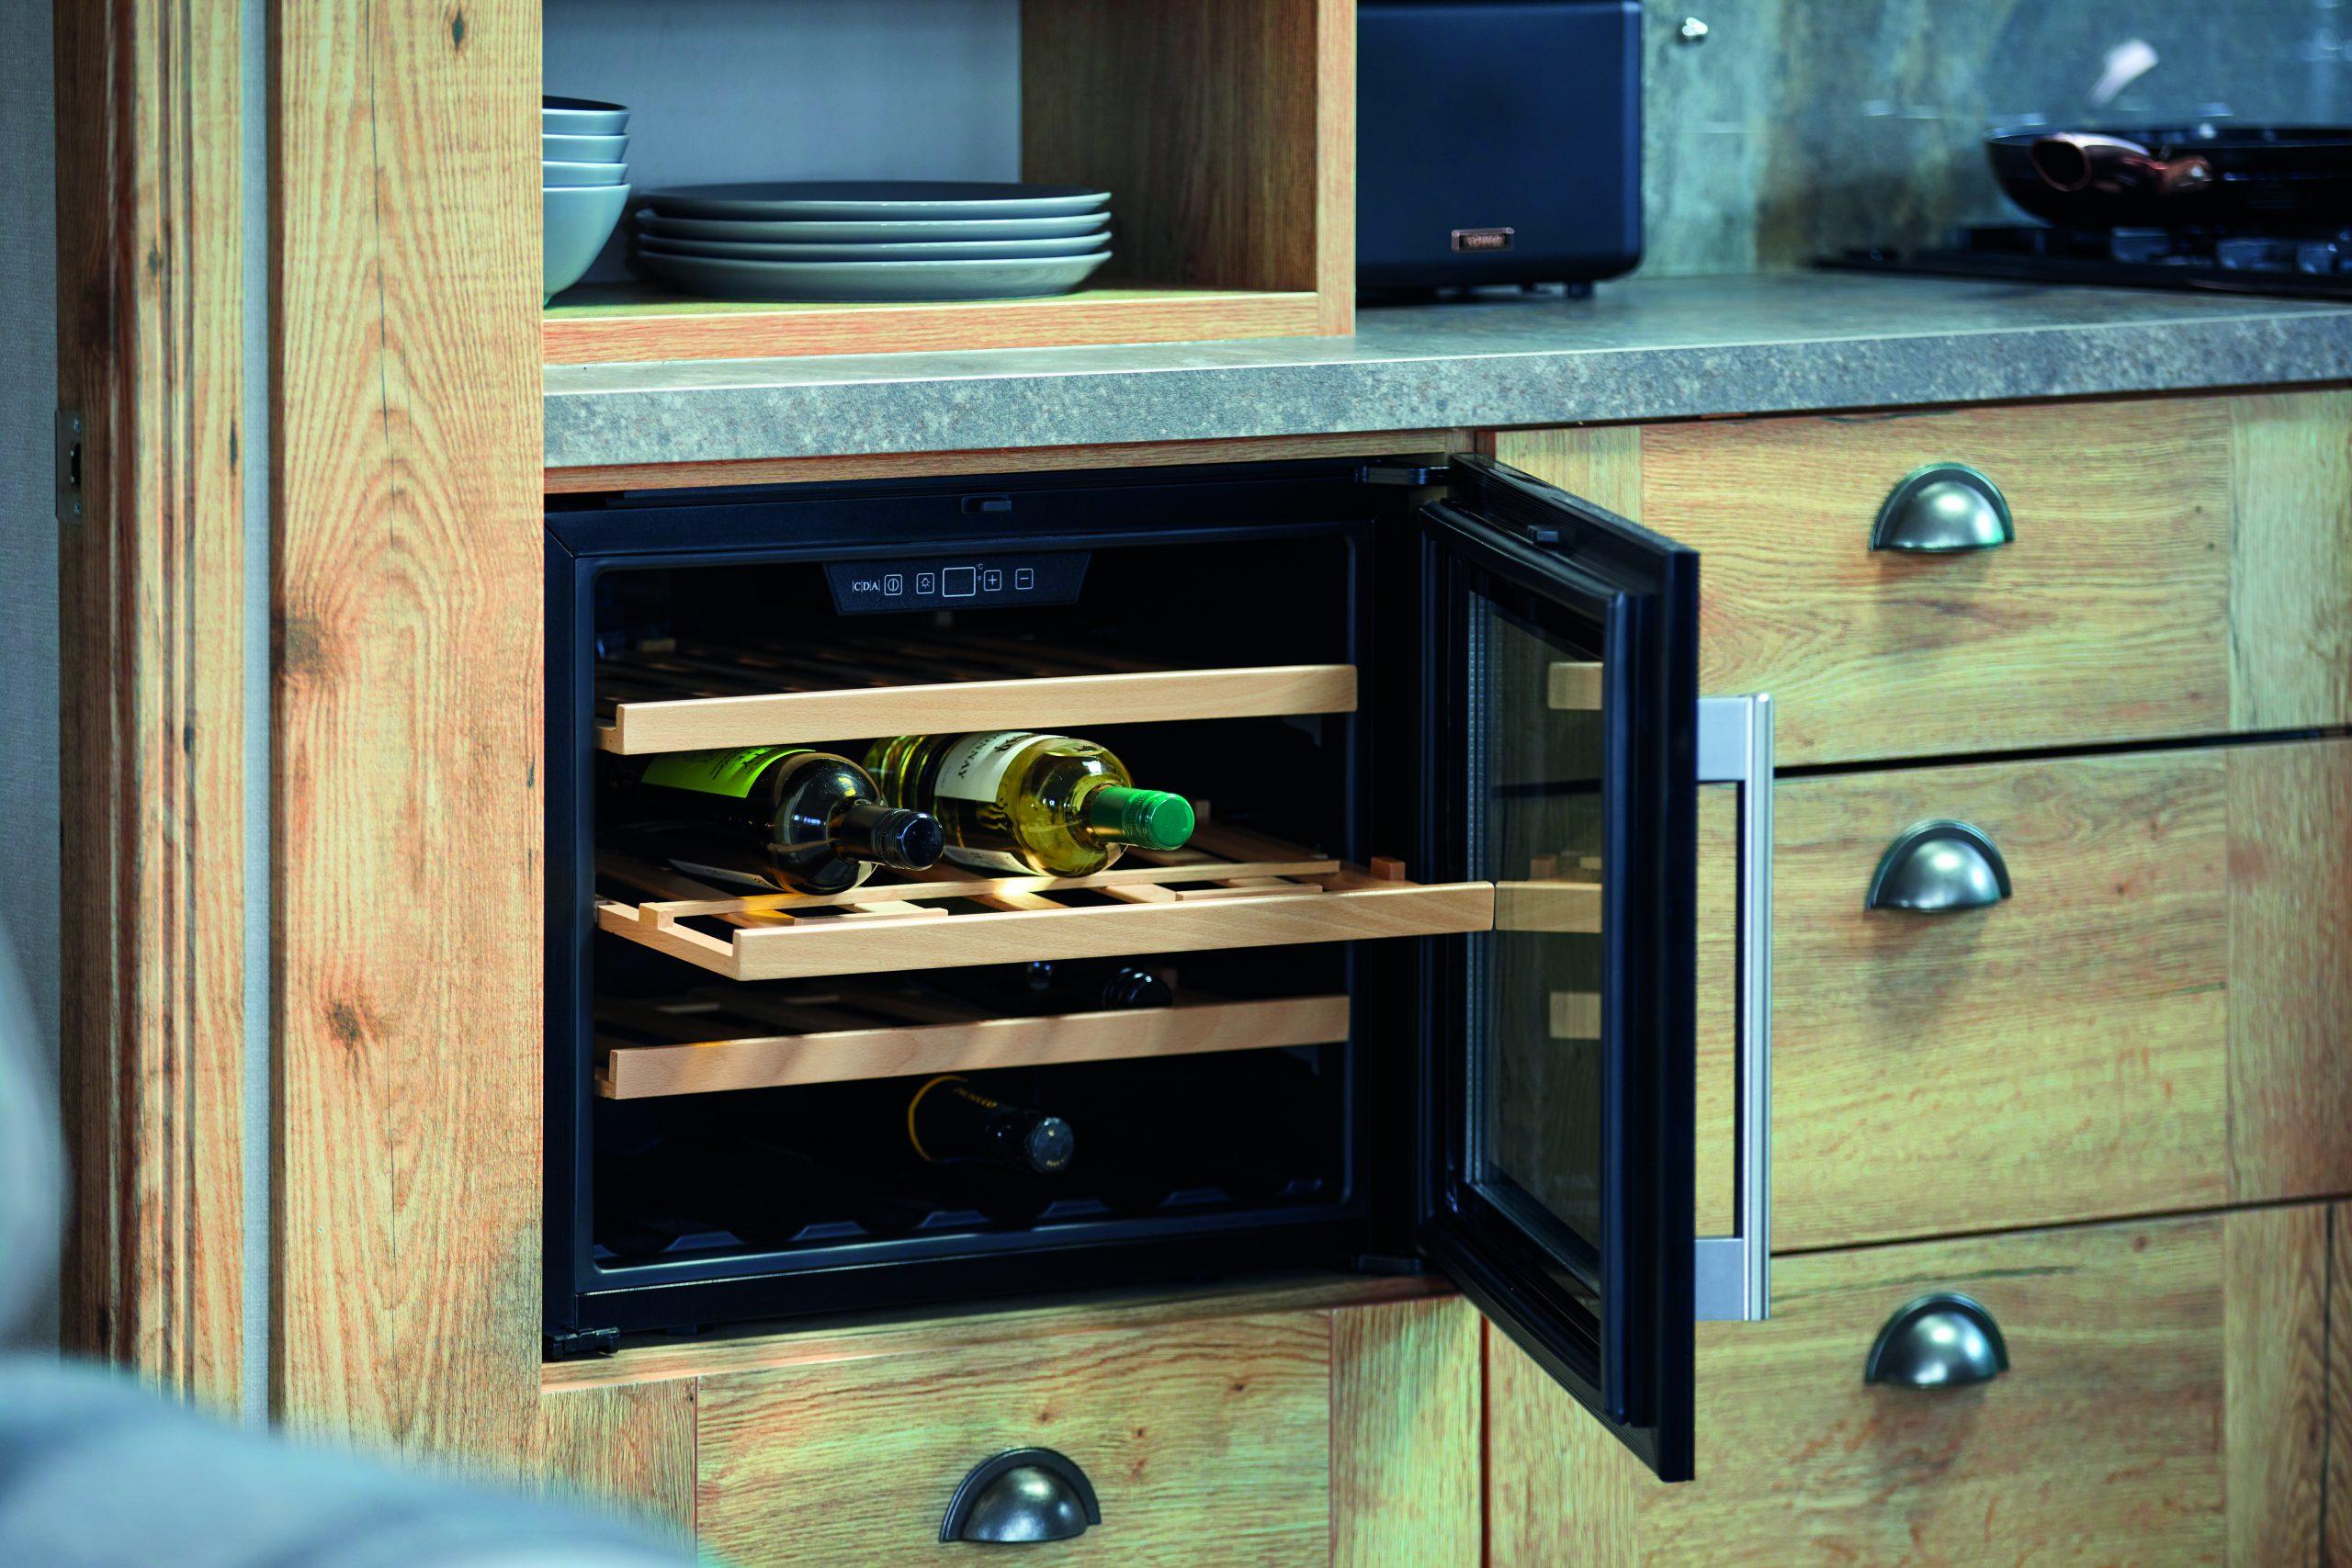 wine fridge built into counter